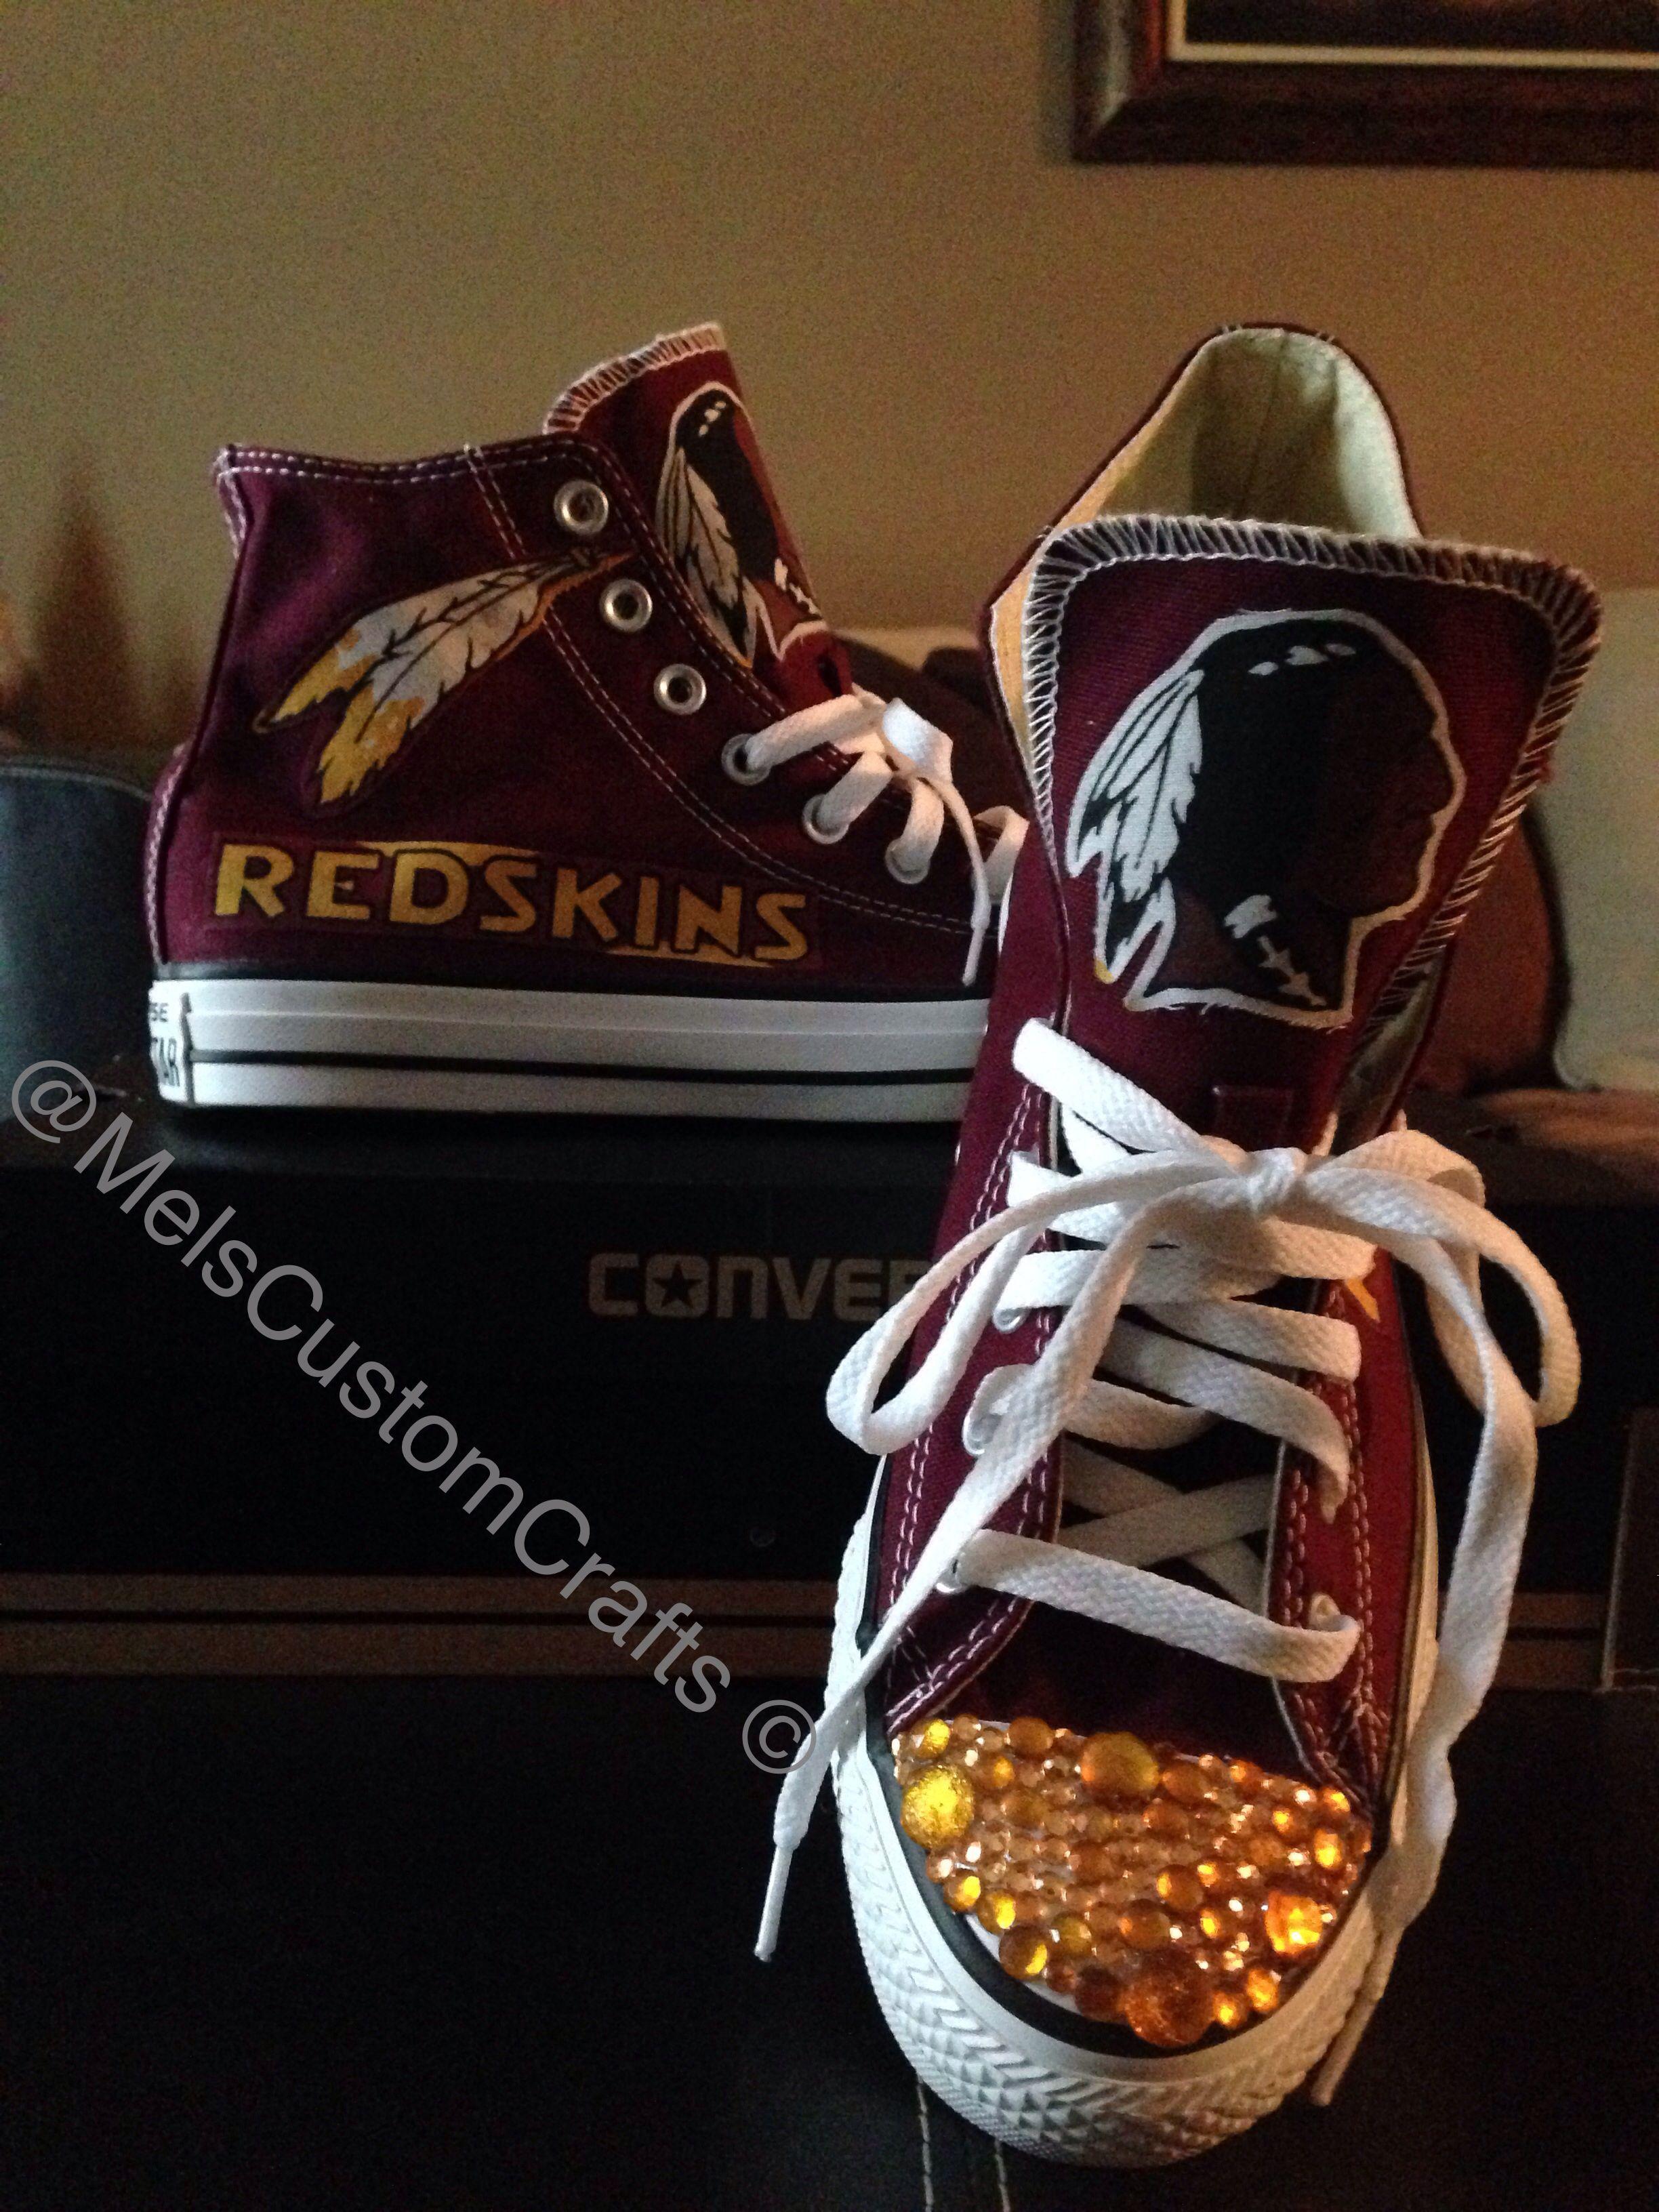 086fce81 Burgundy custom high top converse. Redskin football inspired with ...